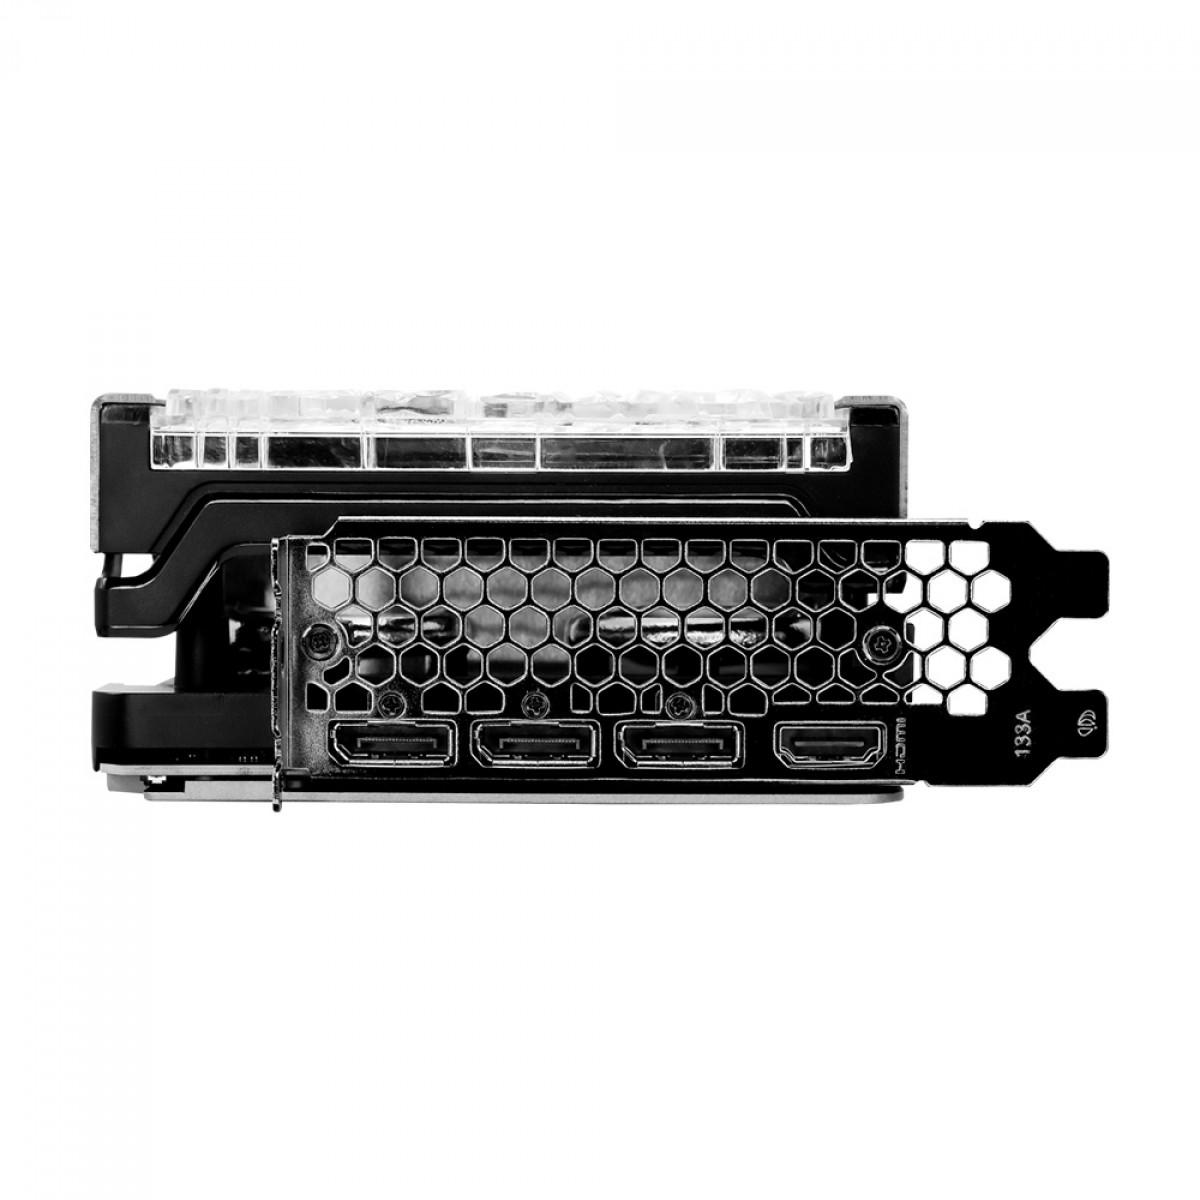 Placa de Vídeo Palit NVIDIA GeForce RTX 3070 TI GameRock OC, 8GB, GDDR6X, 256bit, LHR, NED307TT19P2-1047G